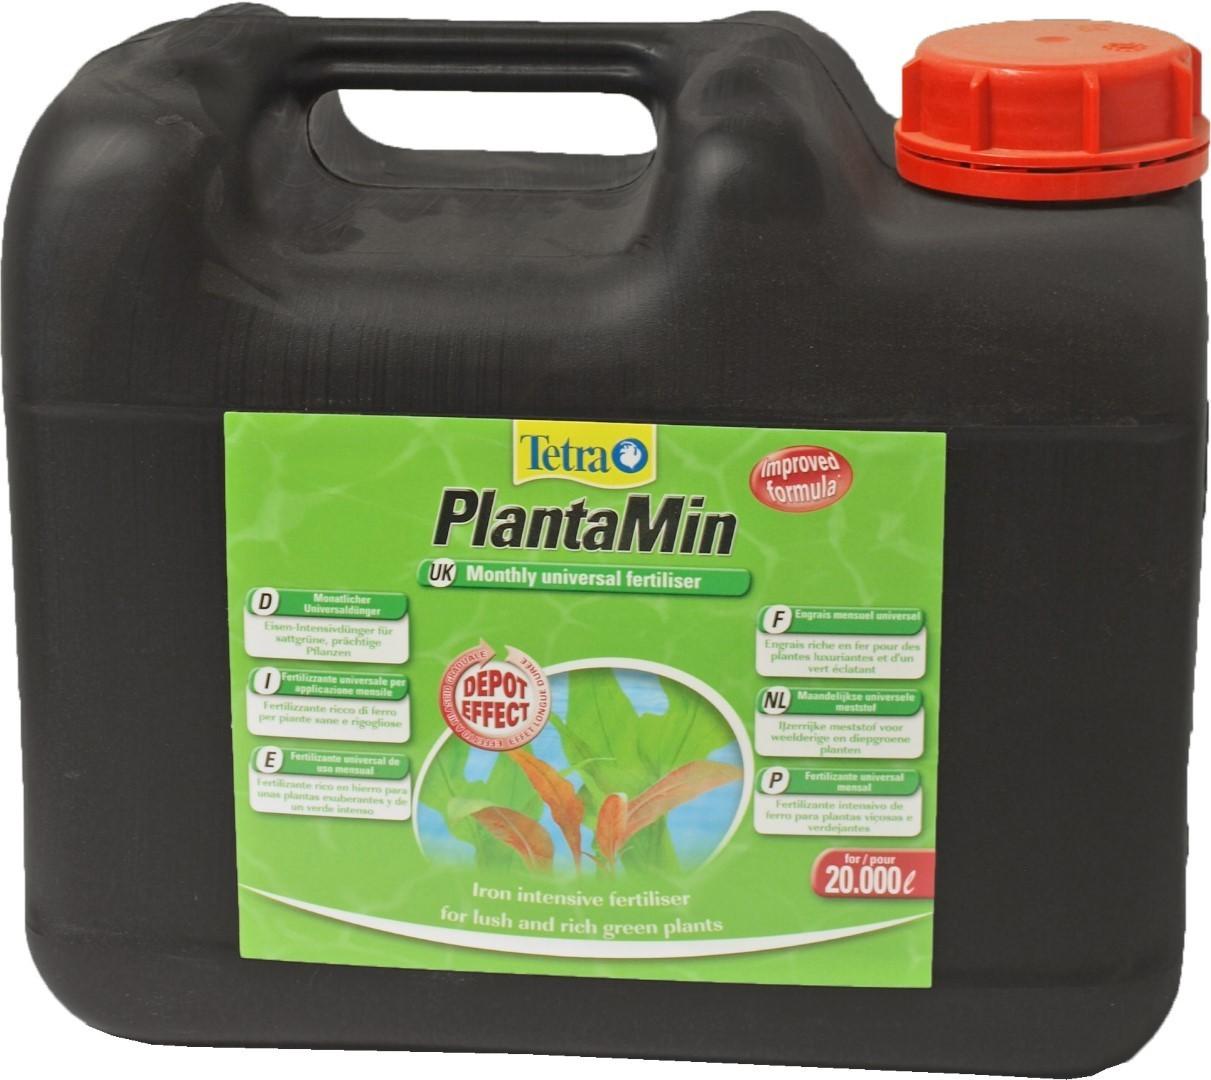 Tetra Plant Planta Min 5 liter